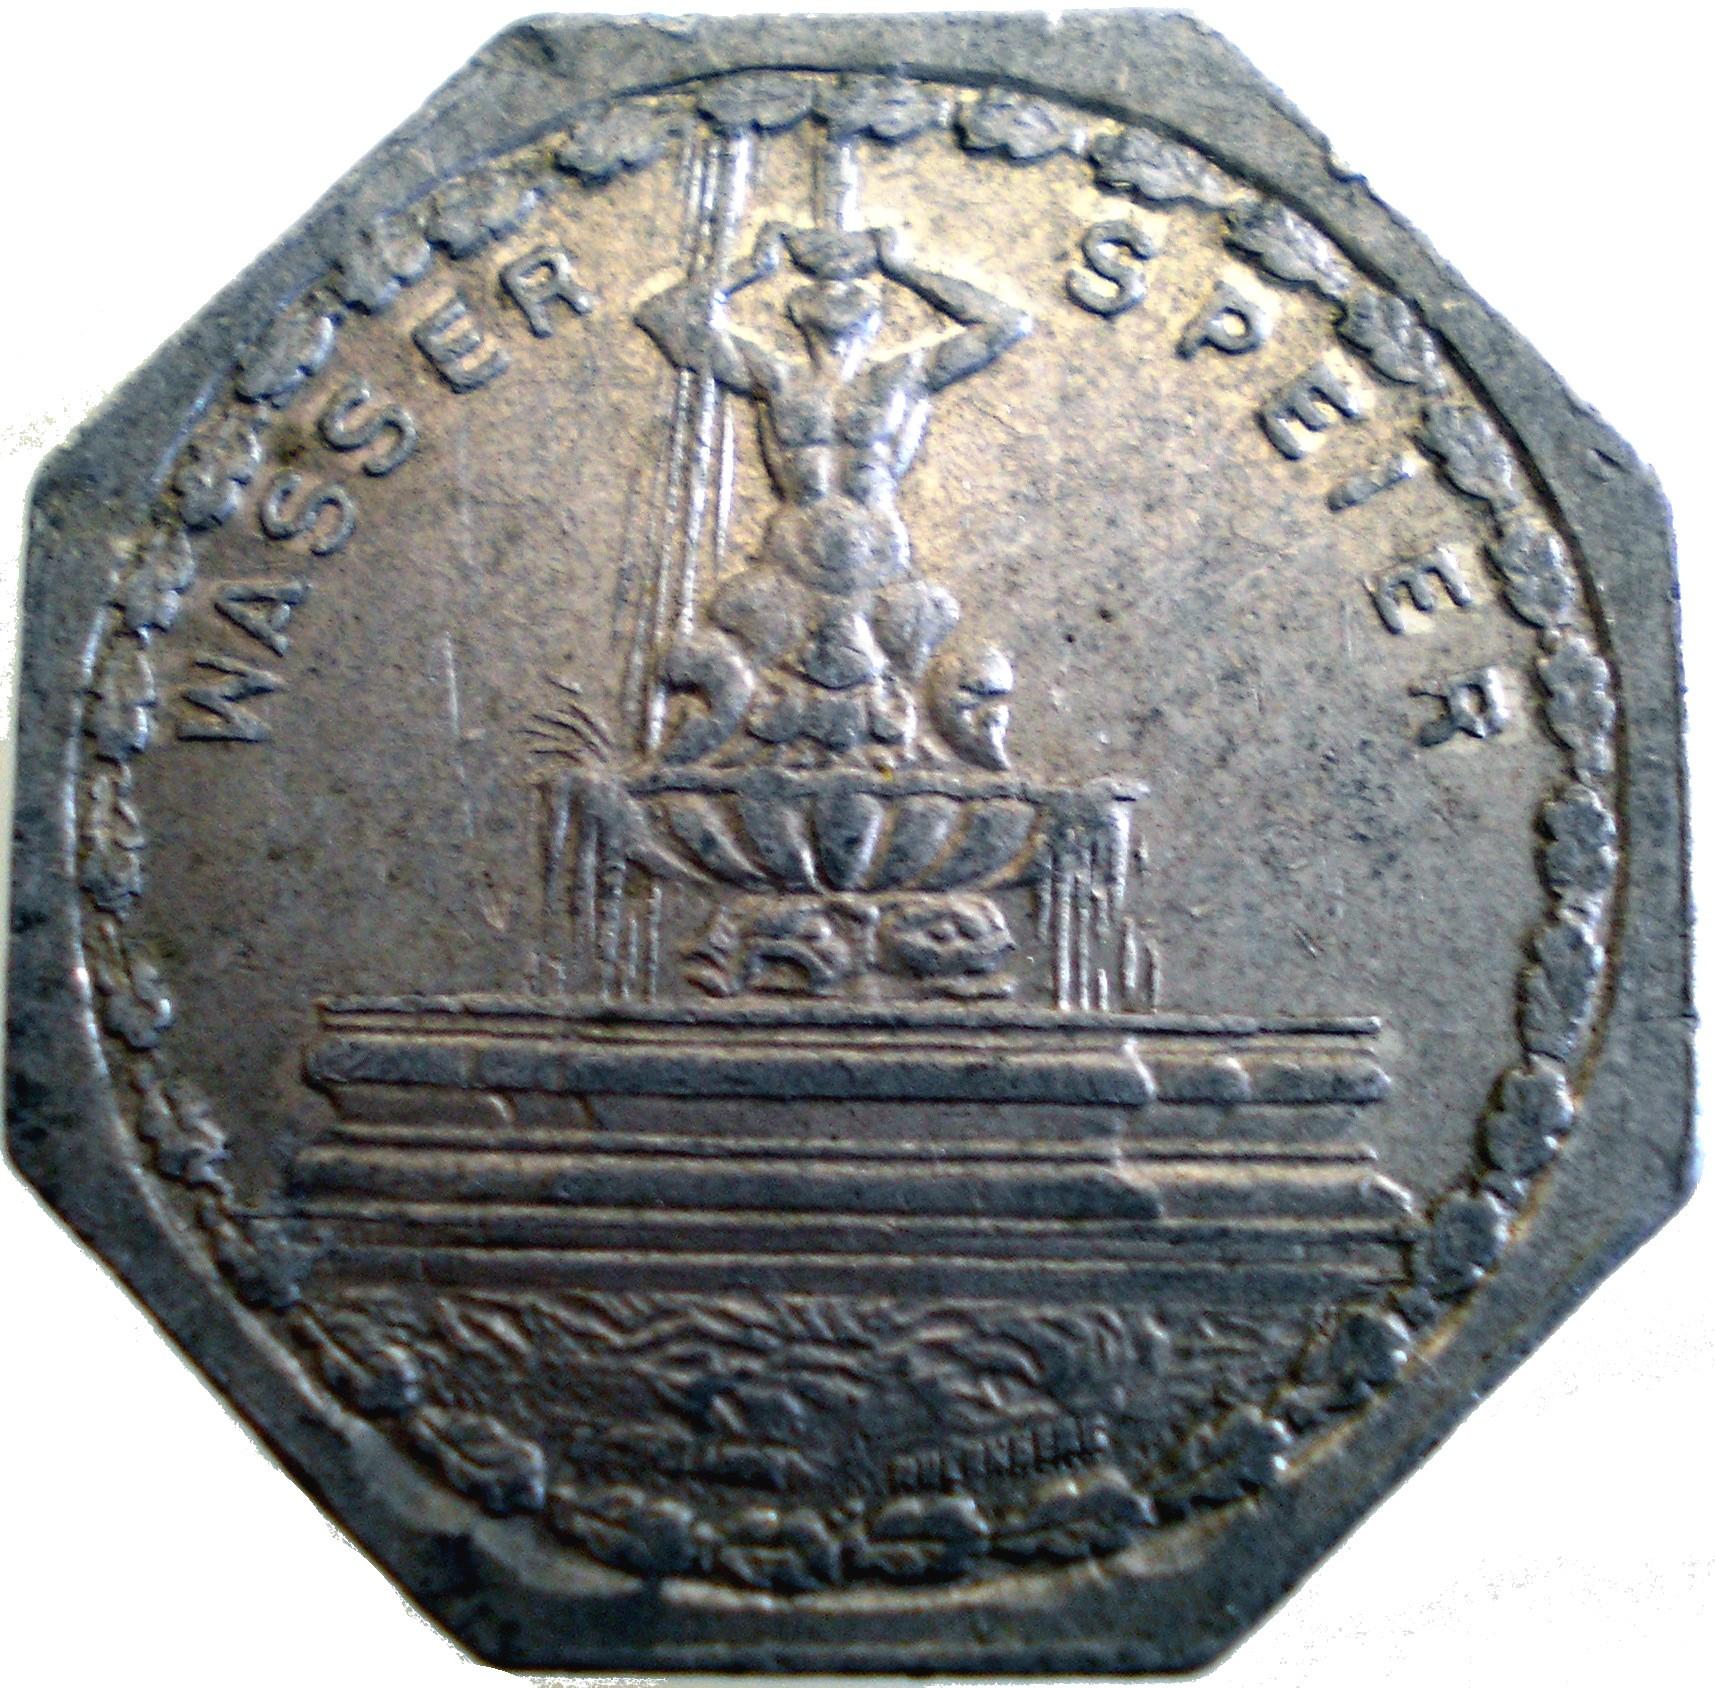 Germany 20 Pfennig (The Gargoyle Fountain-Nürnberg-Fürther)